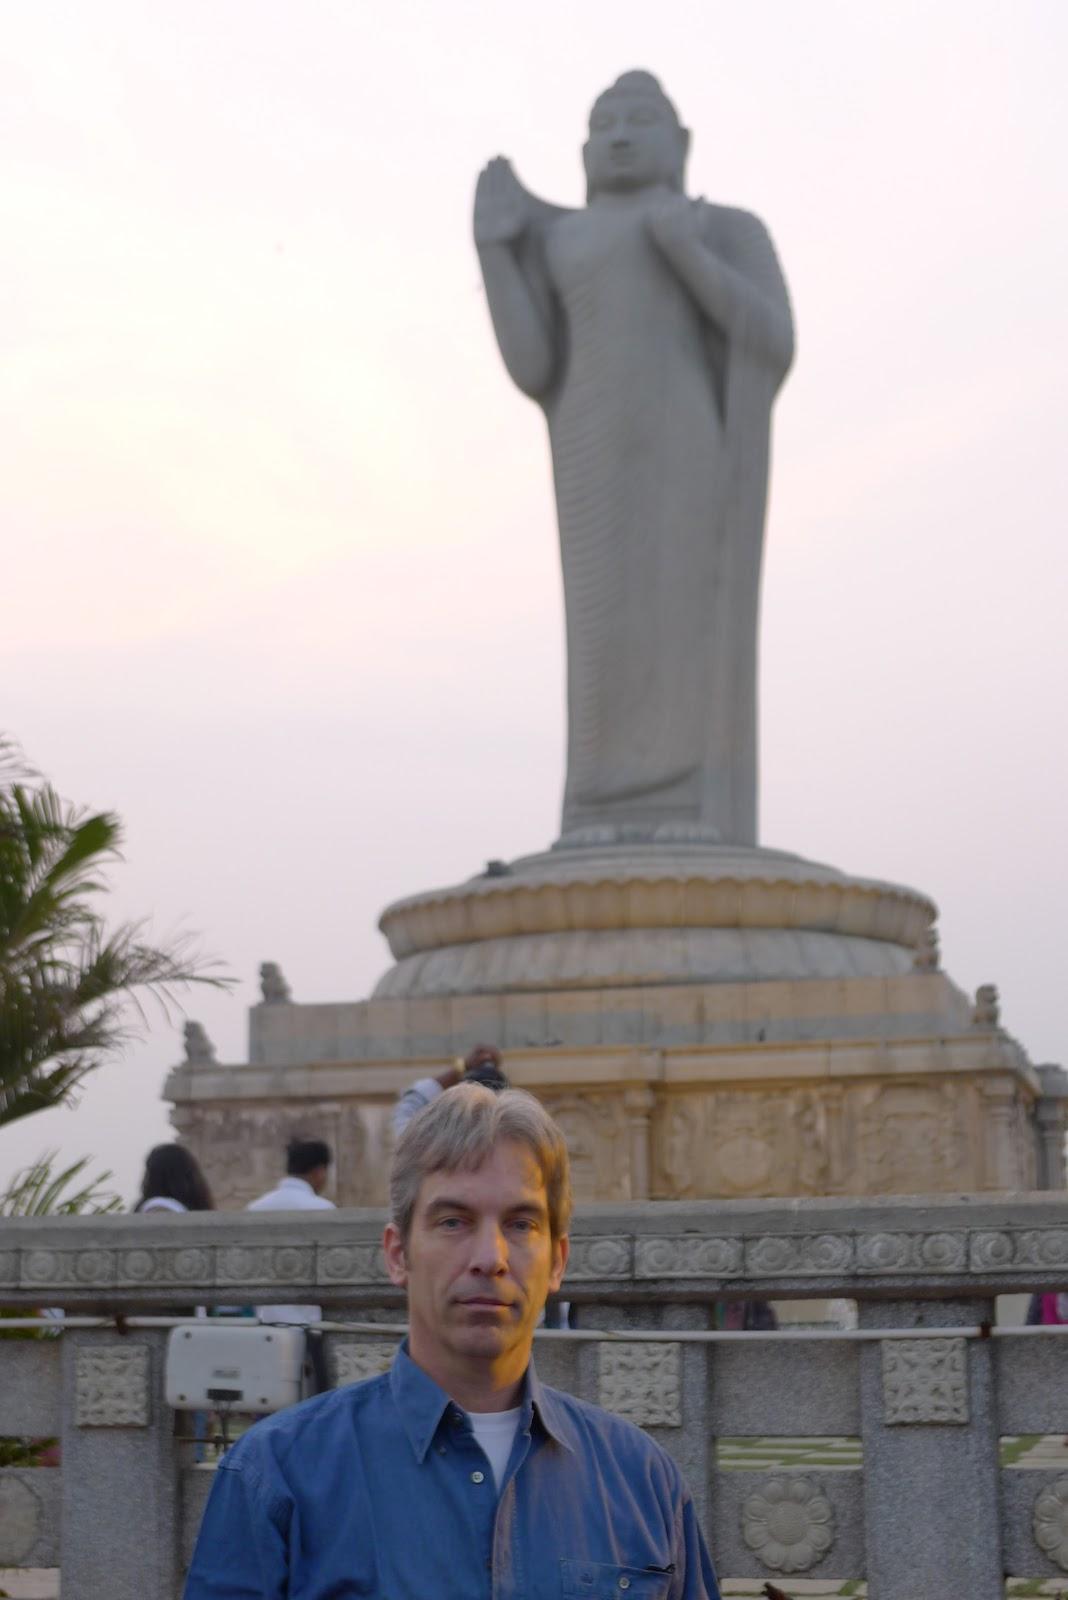 The Buddha in the center of Hyderabad's Hussain Sagar lake (world's tallest monolith of Gautama Buddha)